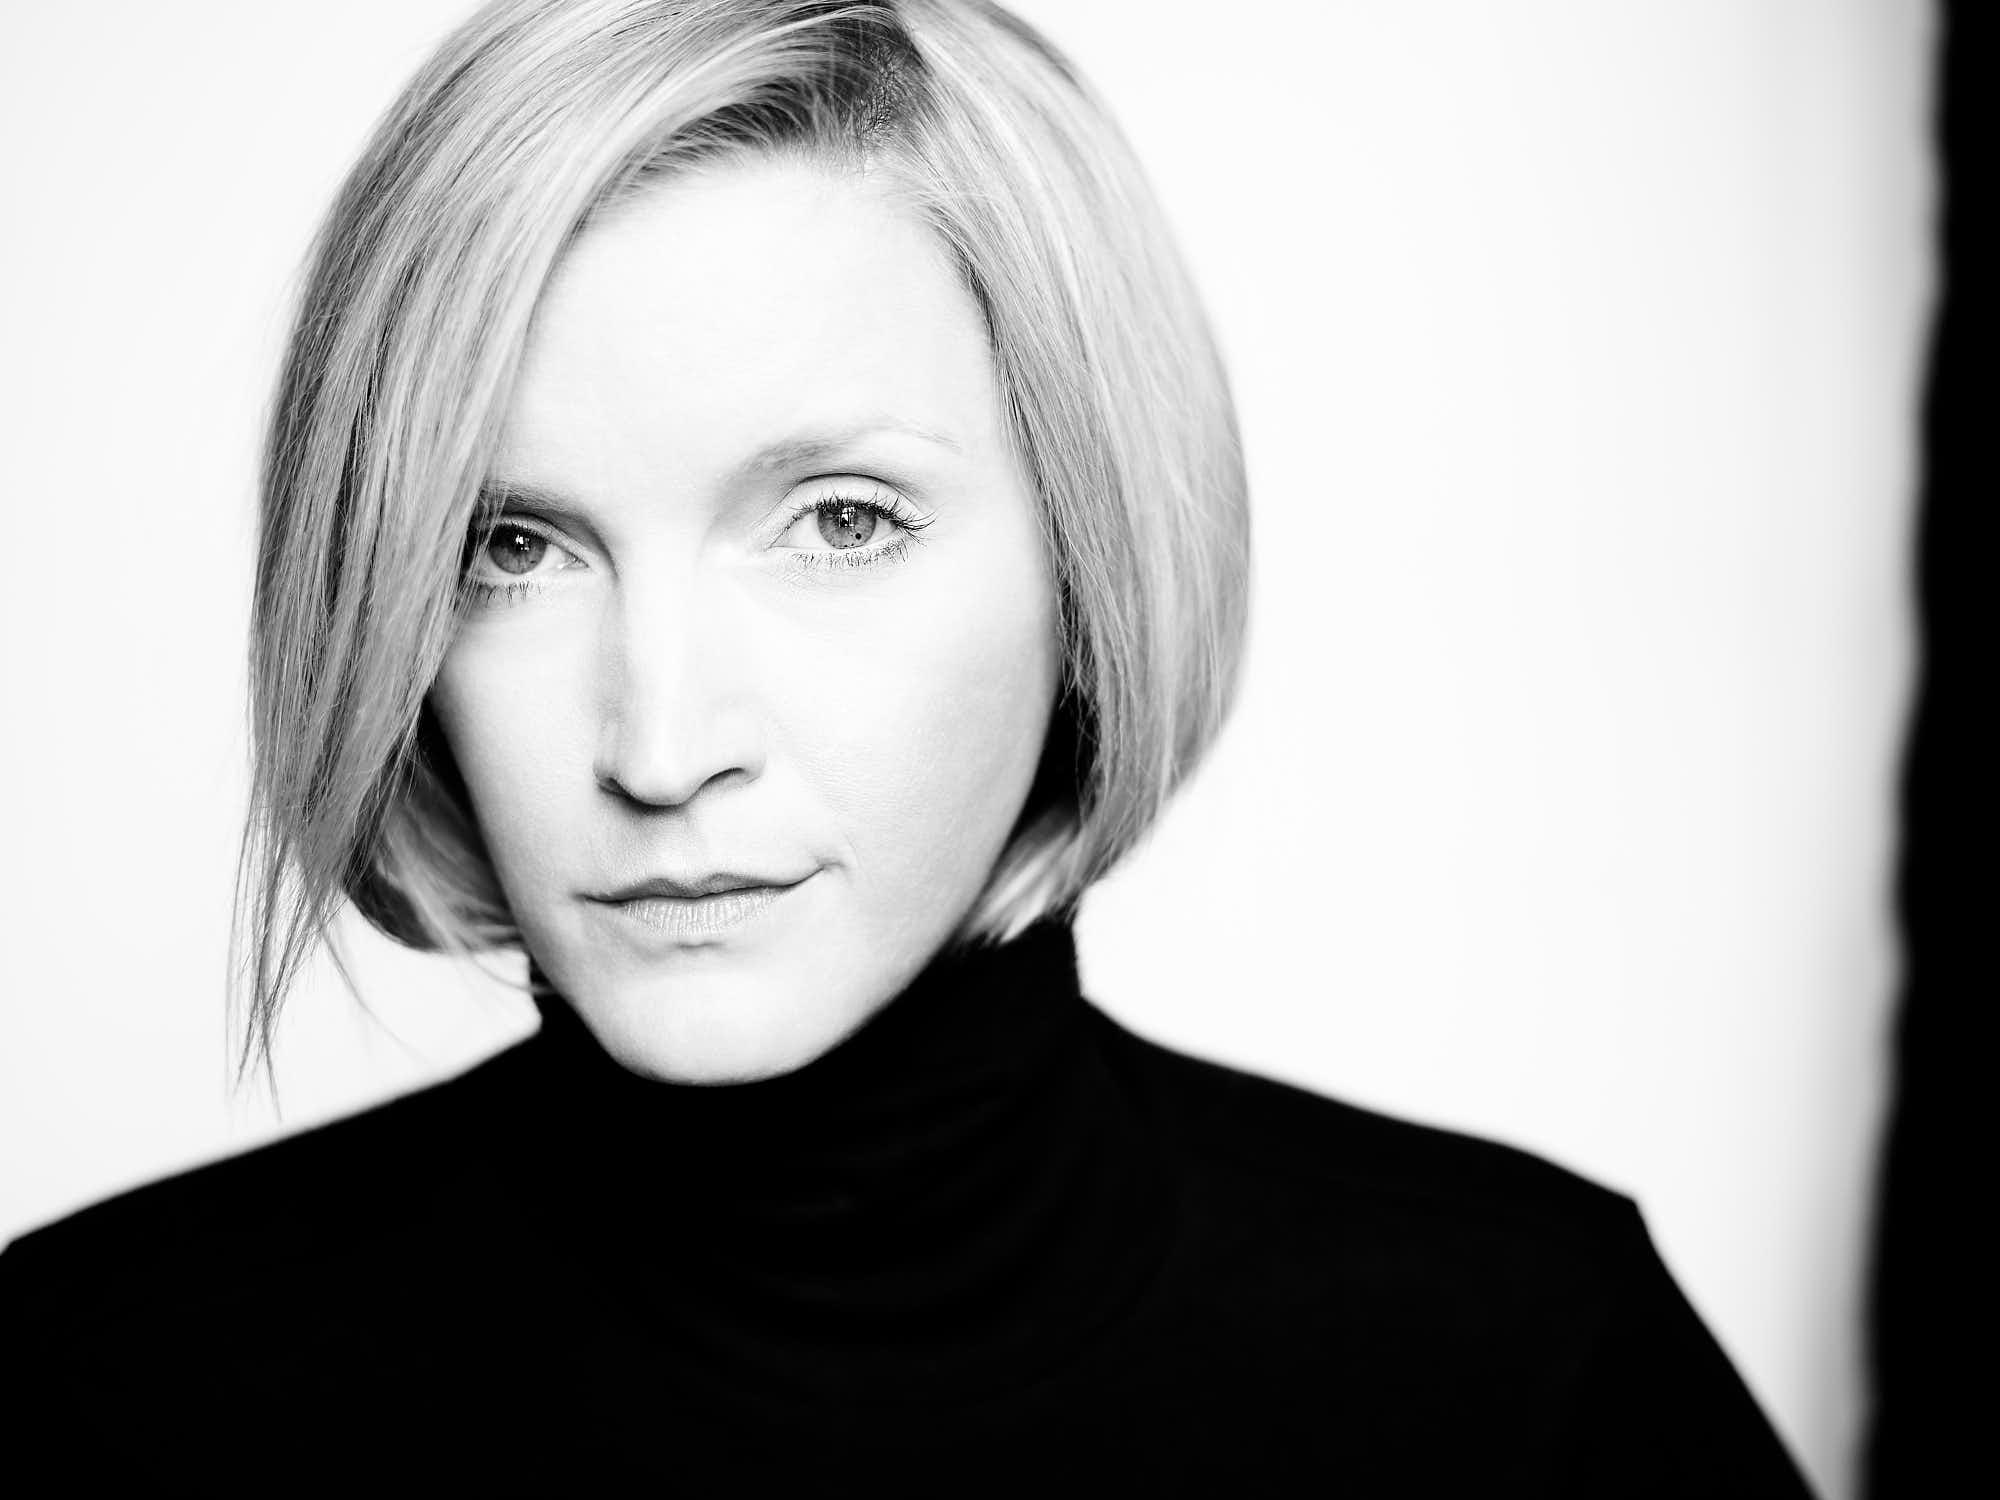 Portrait  BusinessFotografie Mnchen  Dominik Osswald